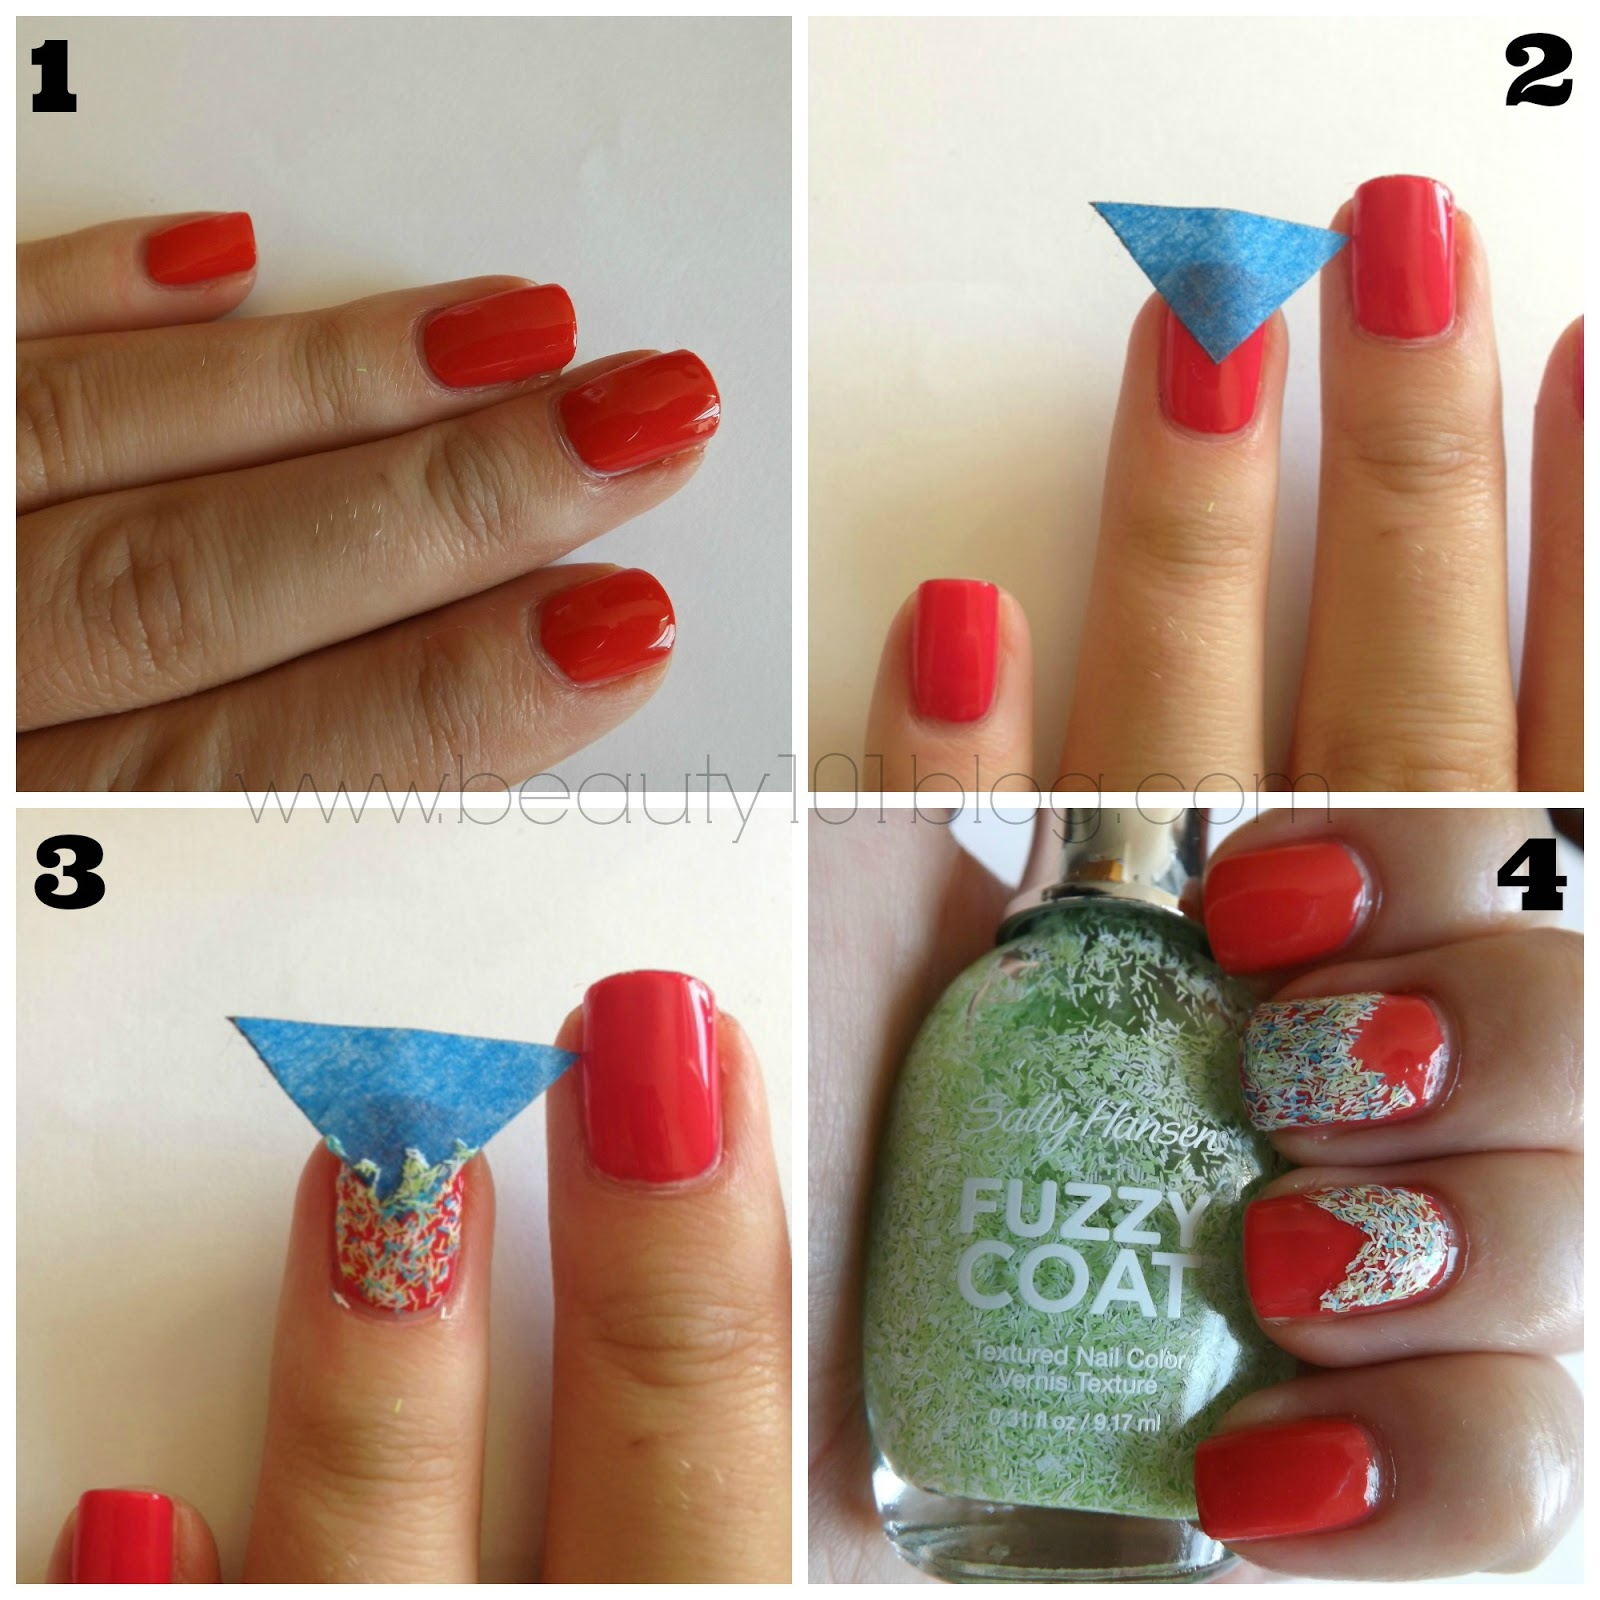 Sally Hansen Fuzzy Coat Color Block Nails Tutorial - Beauty 101